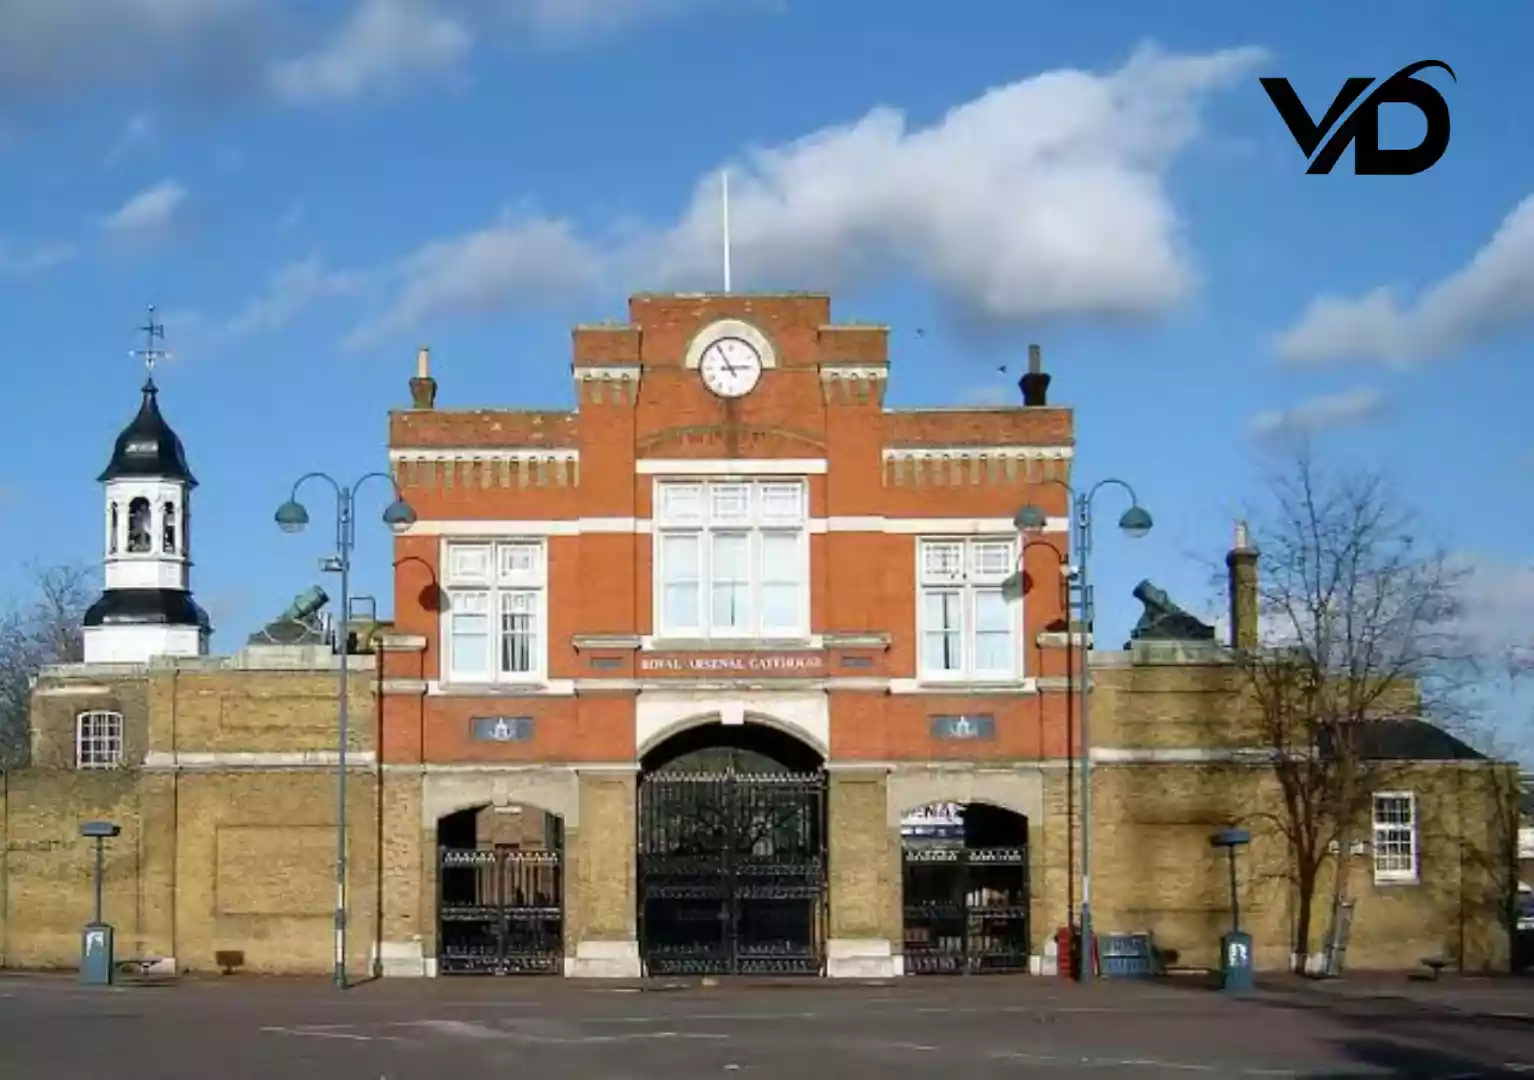 Royal Woolwich Arsenal, London